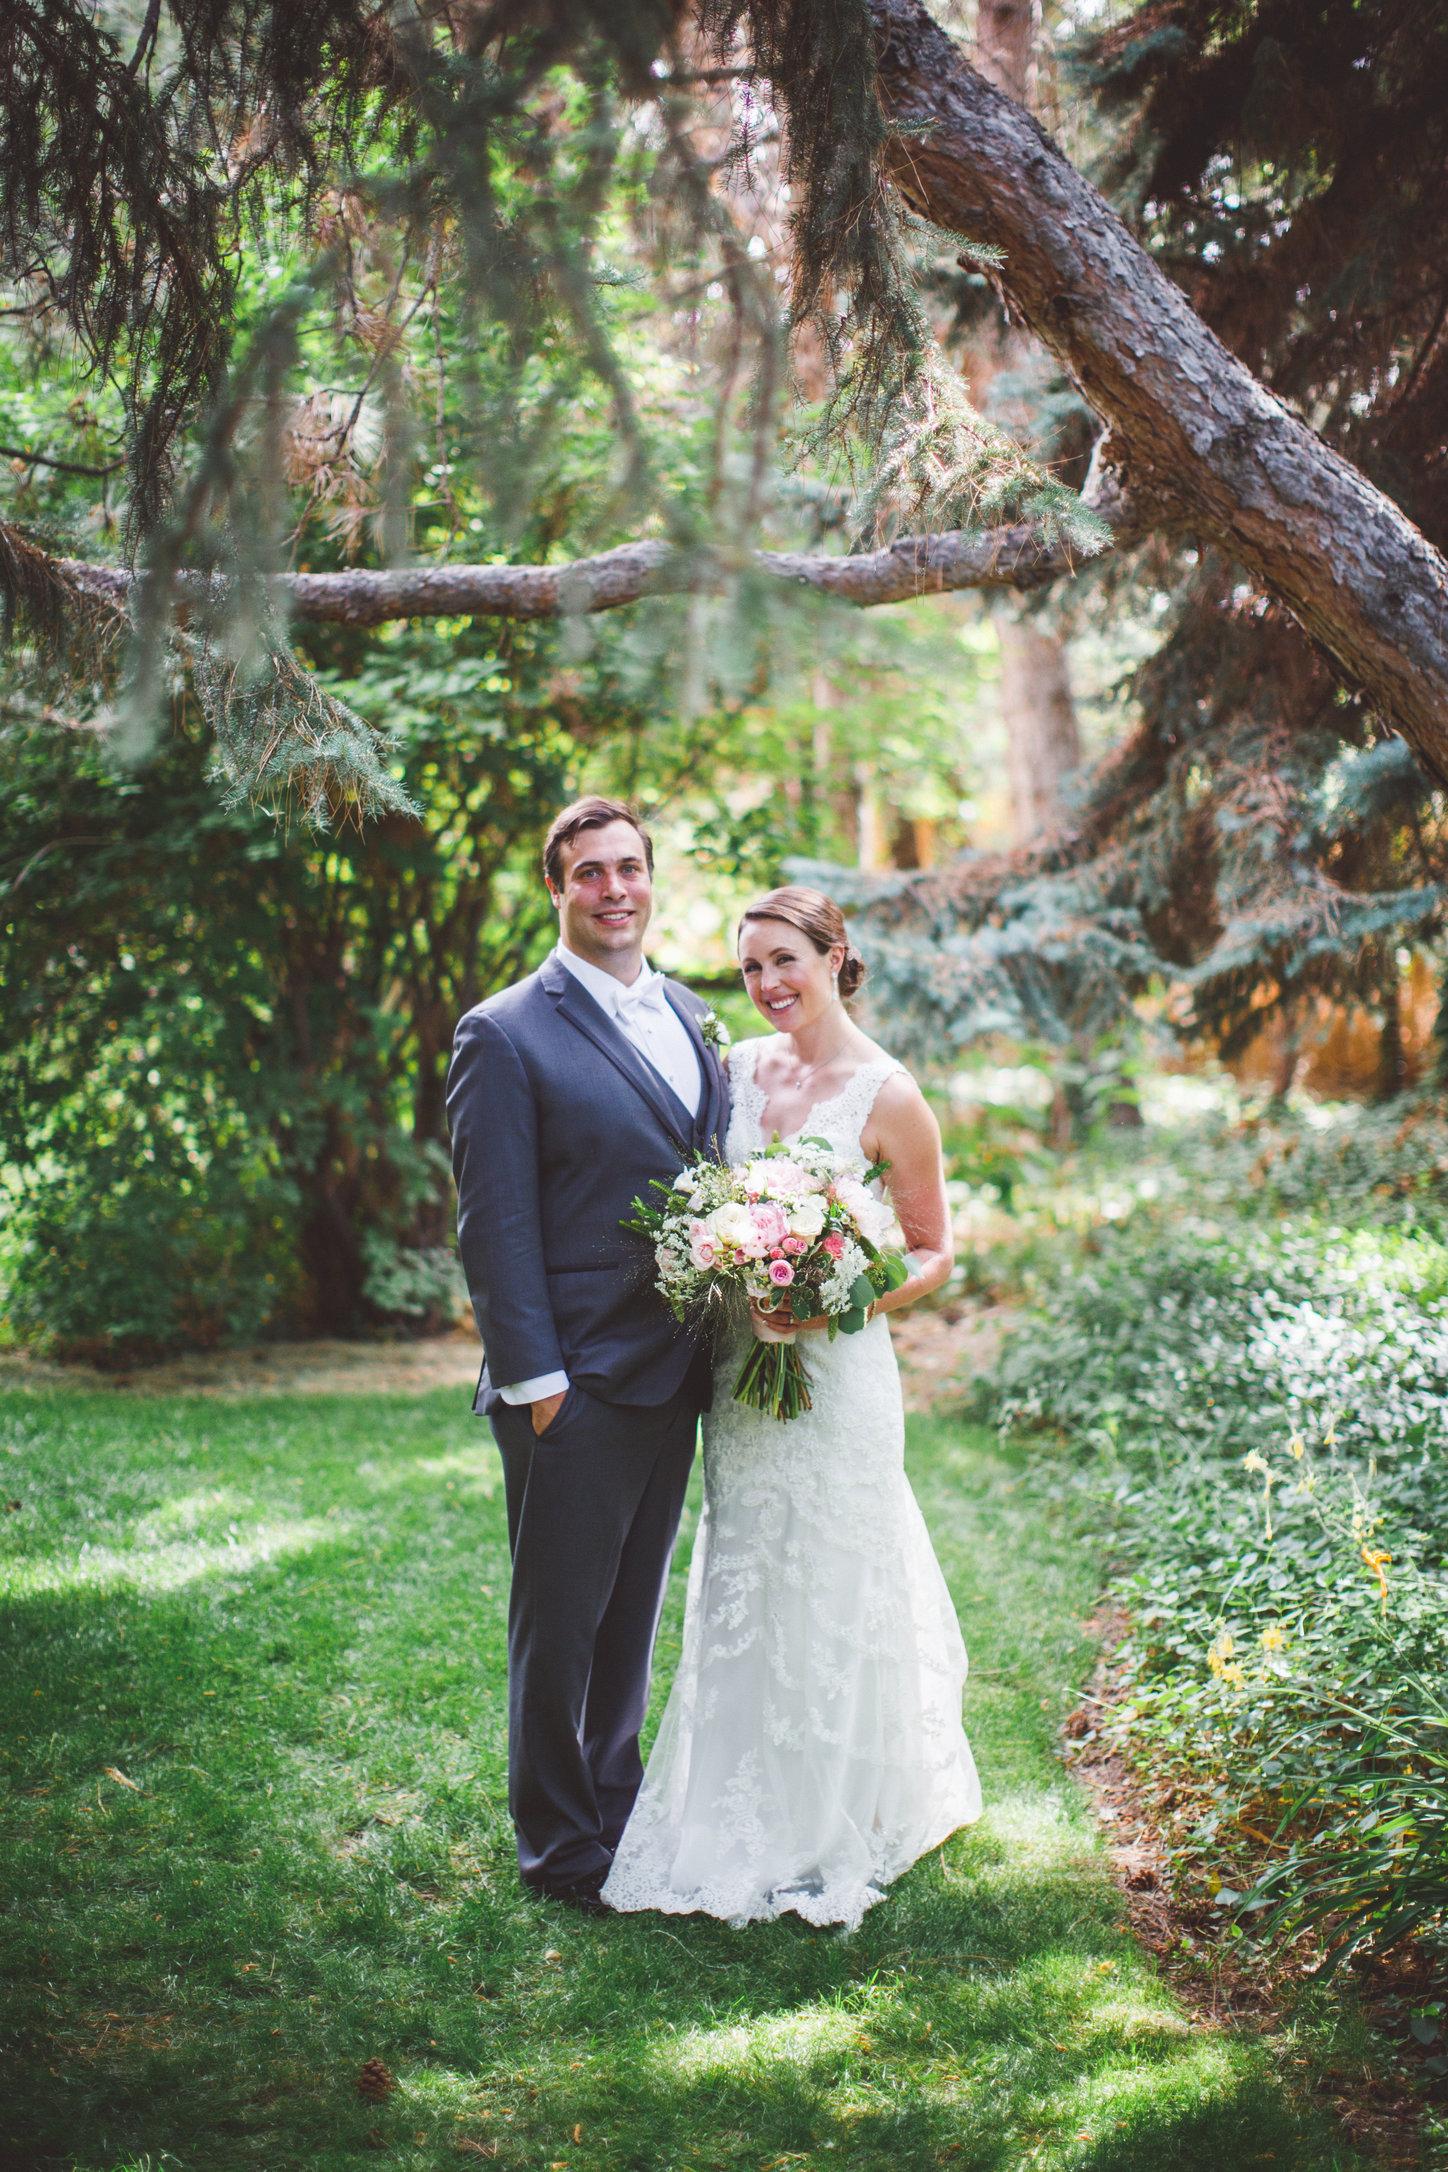 SandC-wedding-375.jpg